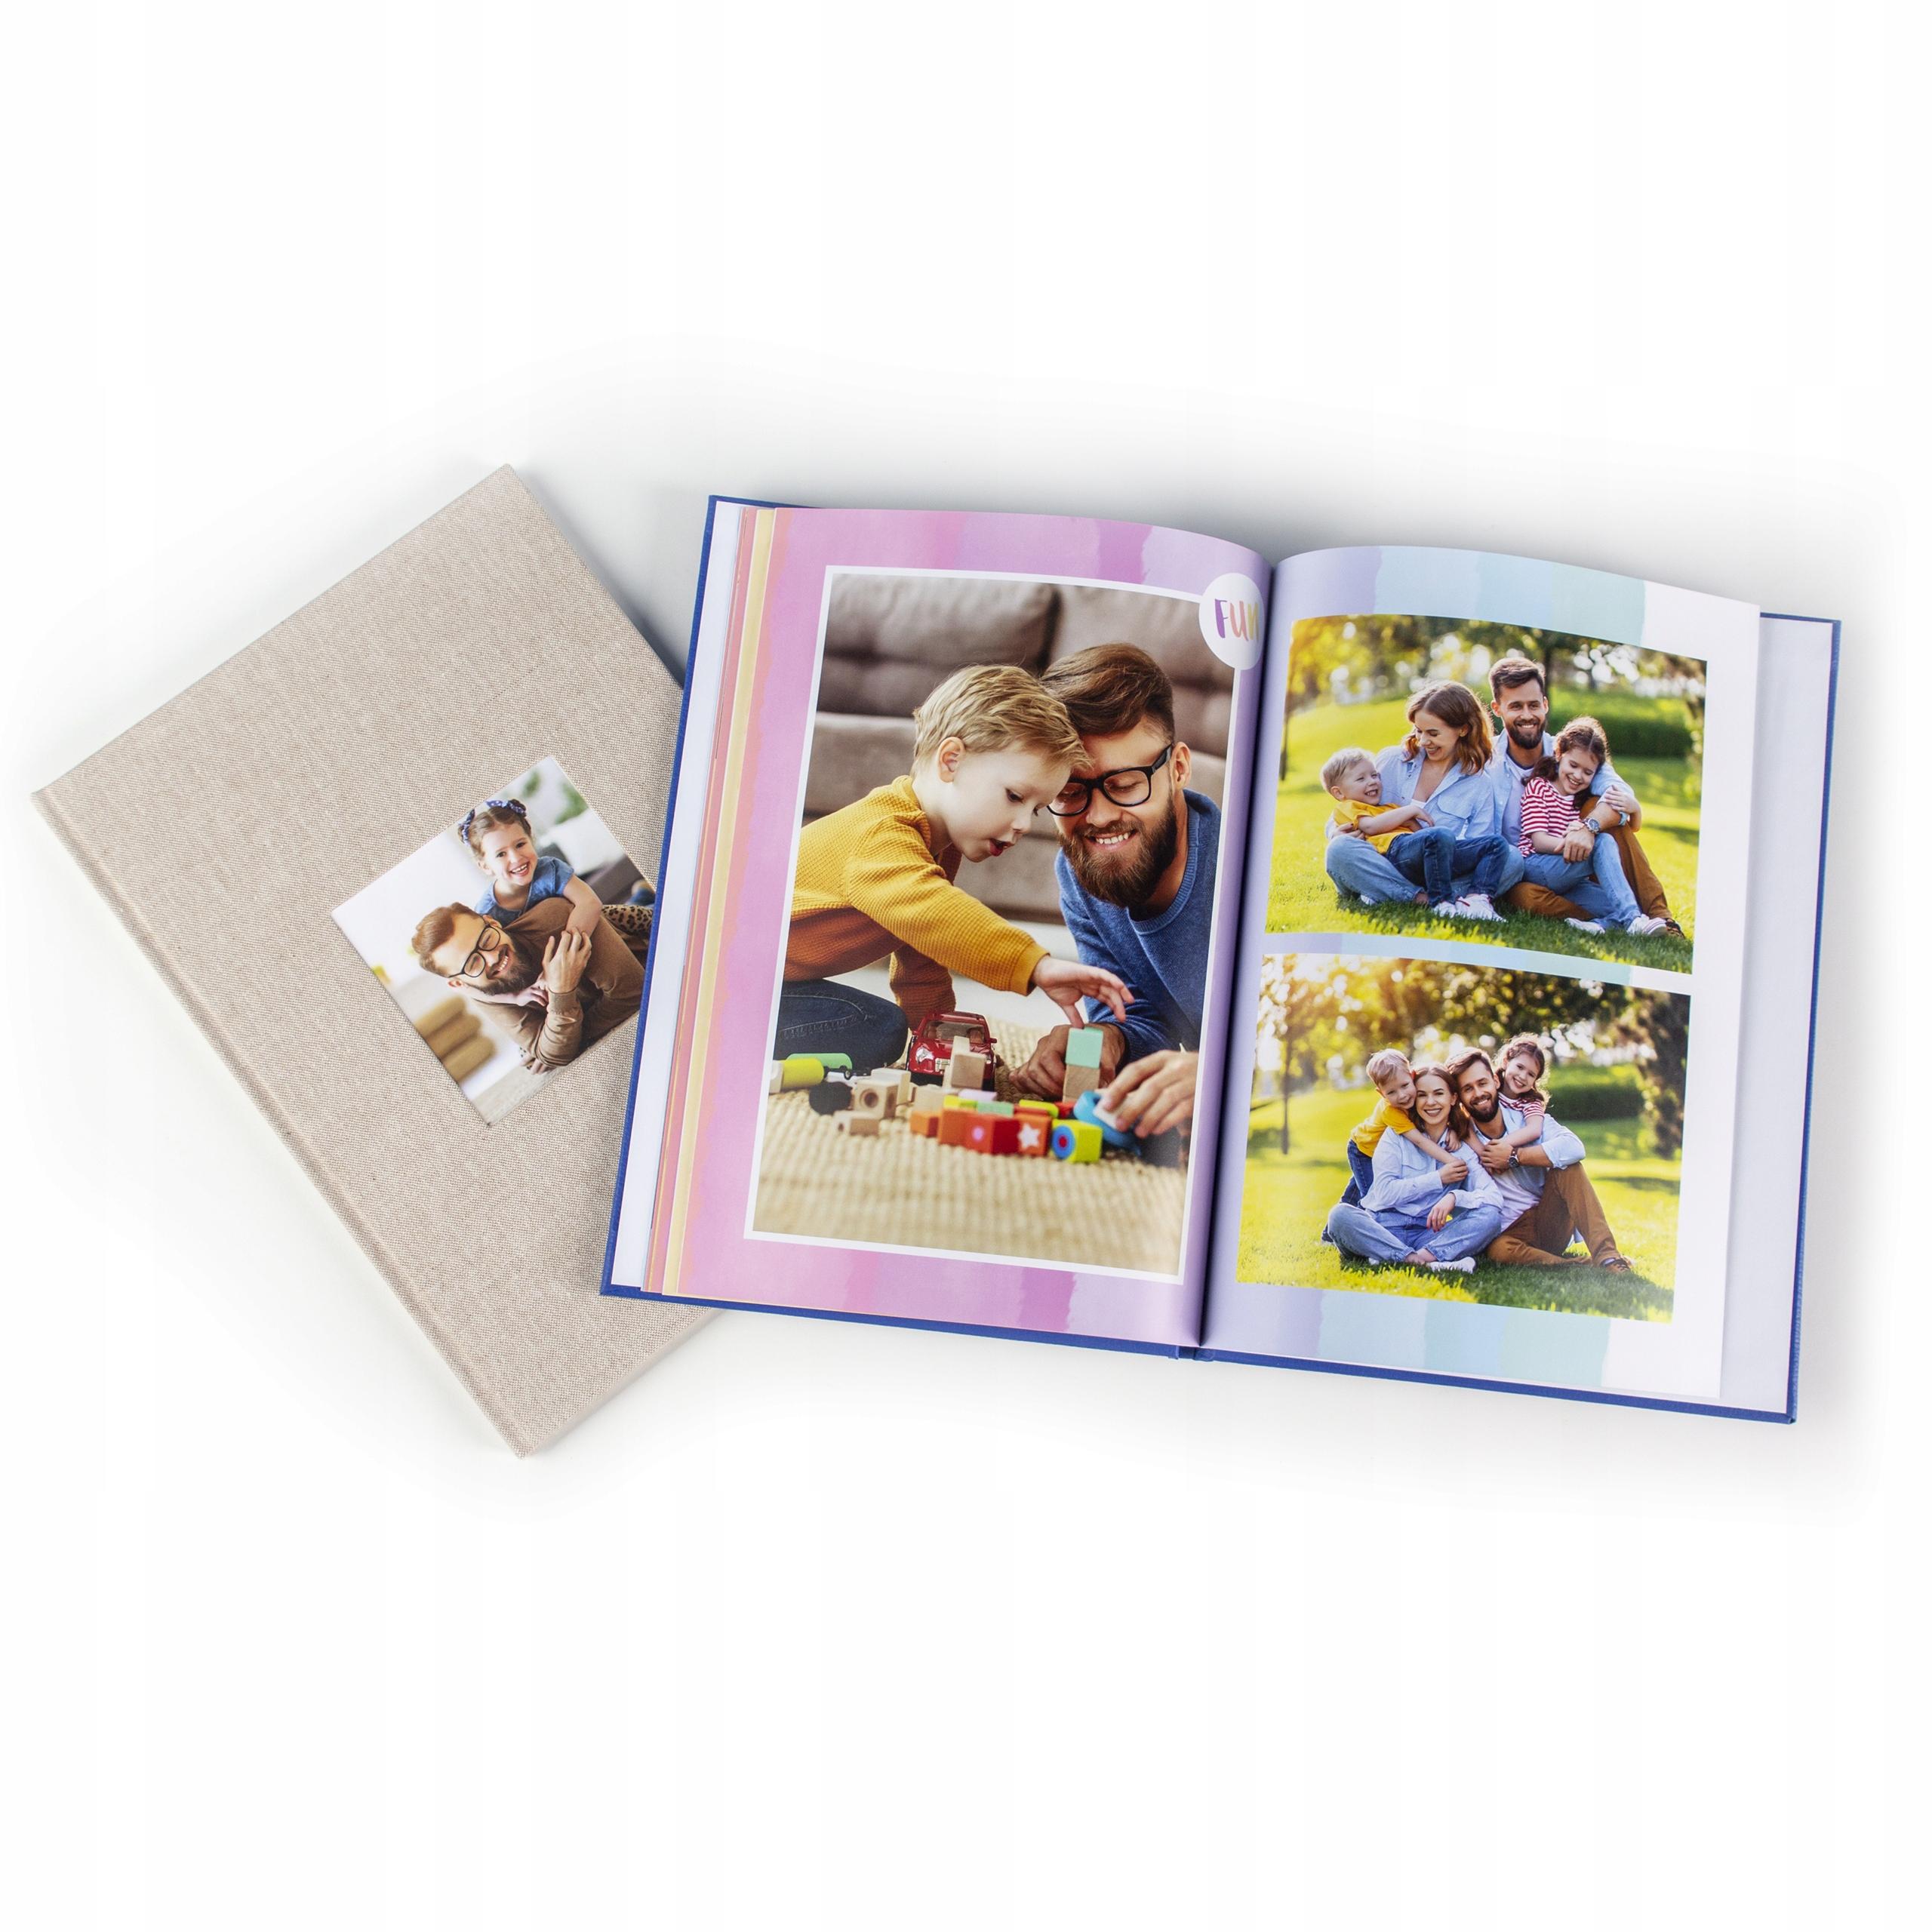 Foto-książka Lux, Foto-album - A4 pion 120 stron